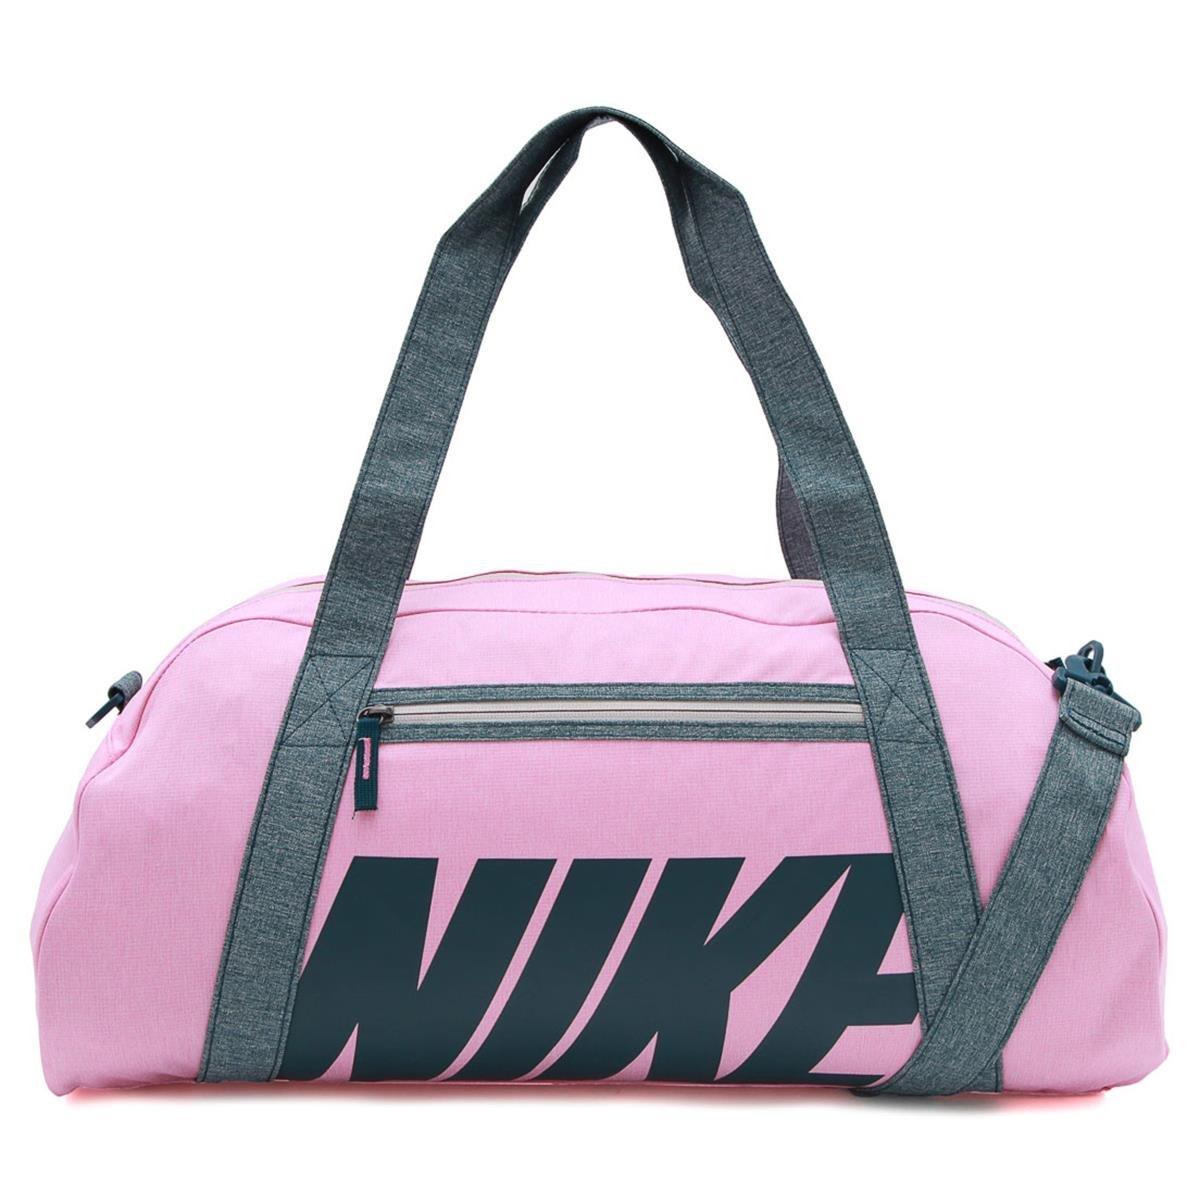 Feminina Bolsa Nike Gym Gym Feminina Bolsa Bolsa Nike Club Nike Gym Club Y6gfby7